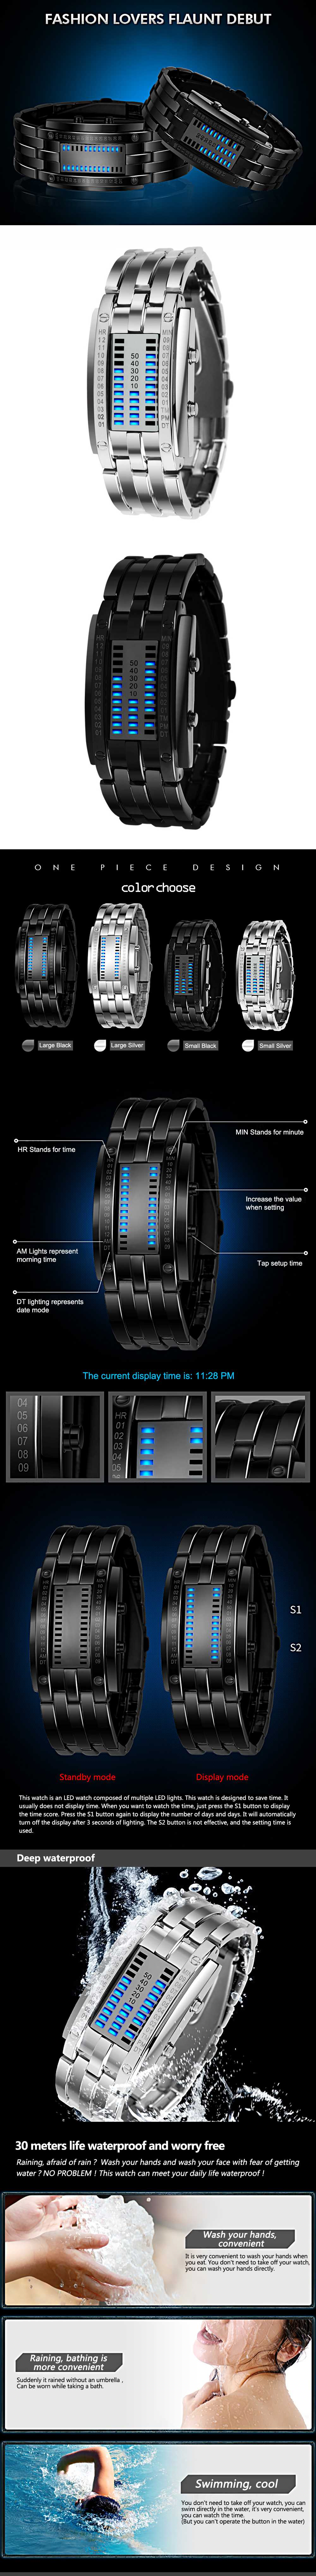 SKMEI Fashion Creative Watch Luxury Brand Digital LED Display Lover's Wristwatches